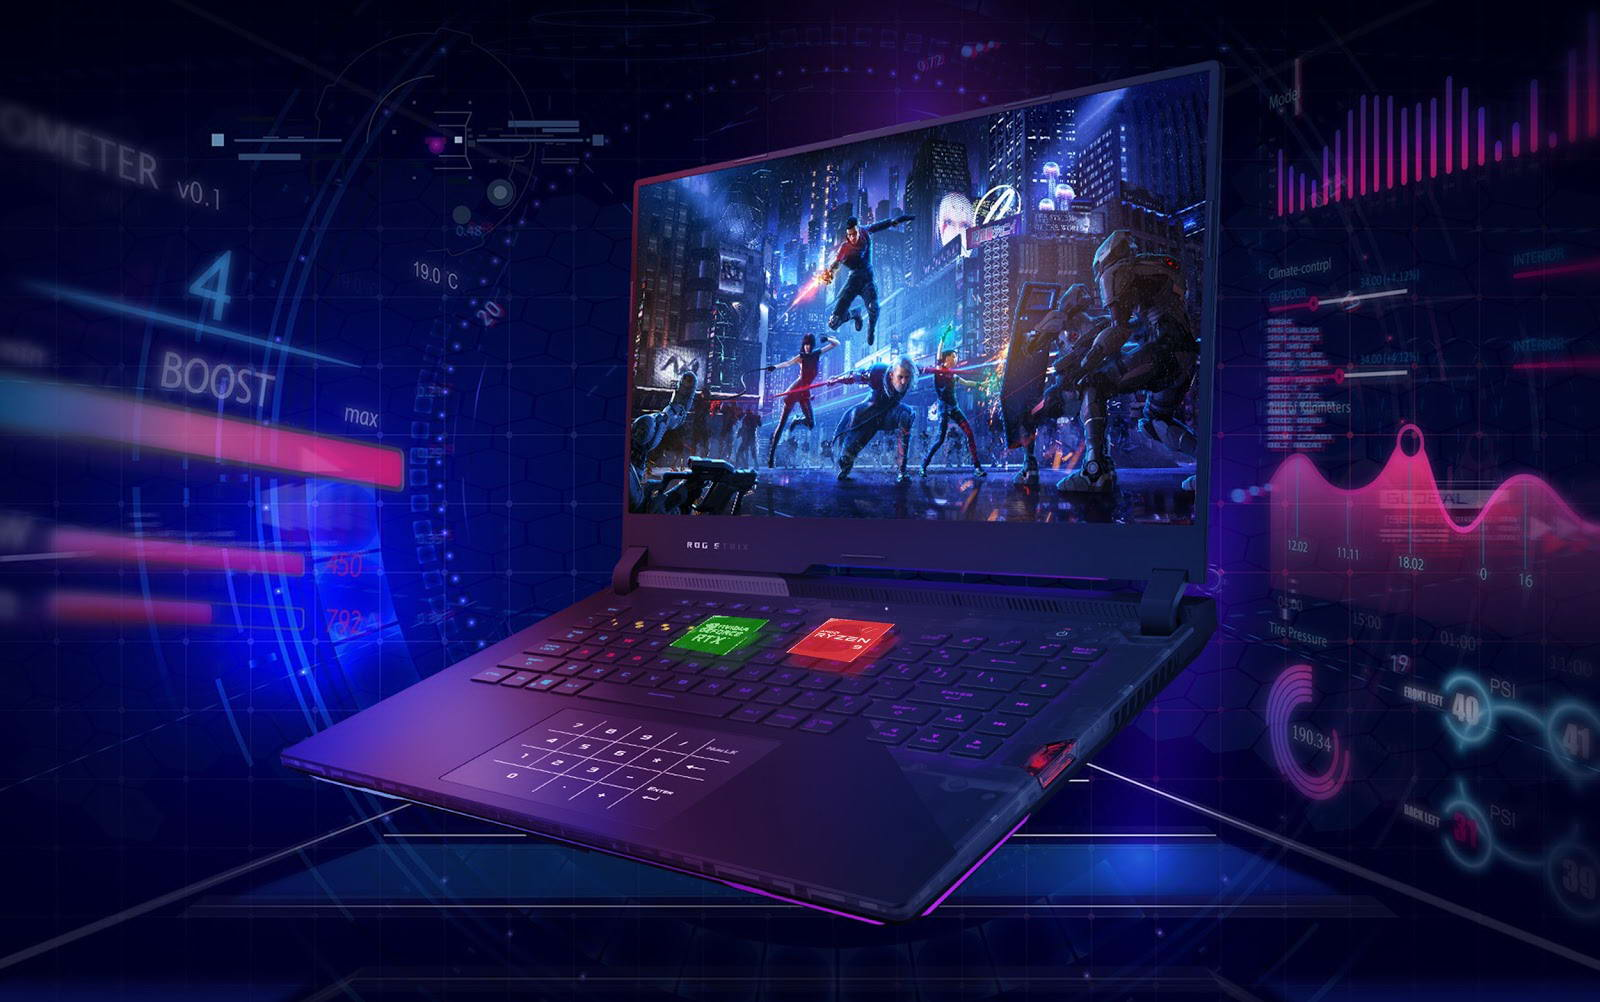 Asus Gaming ROG Strix Scar G533QR hiệu năng